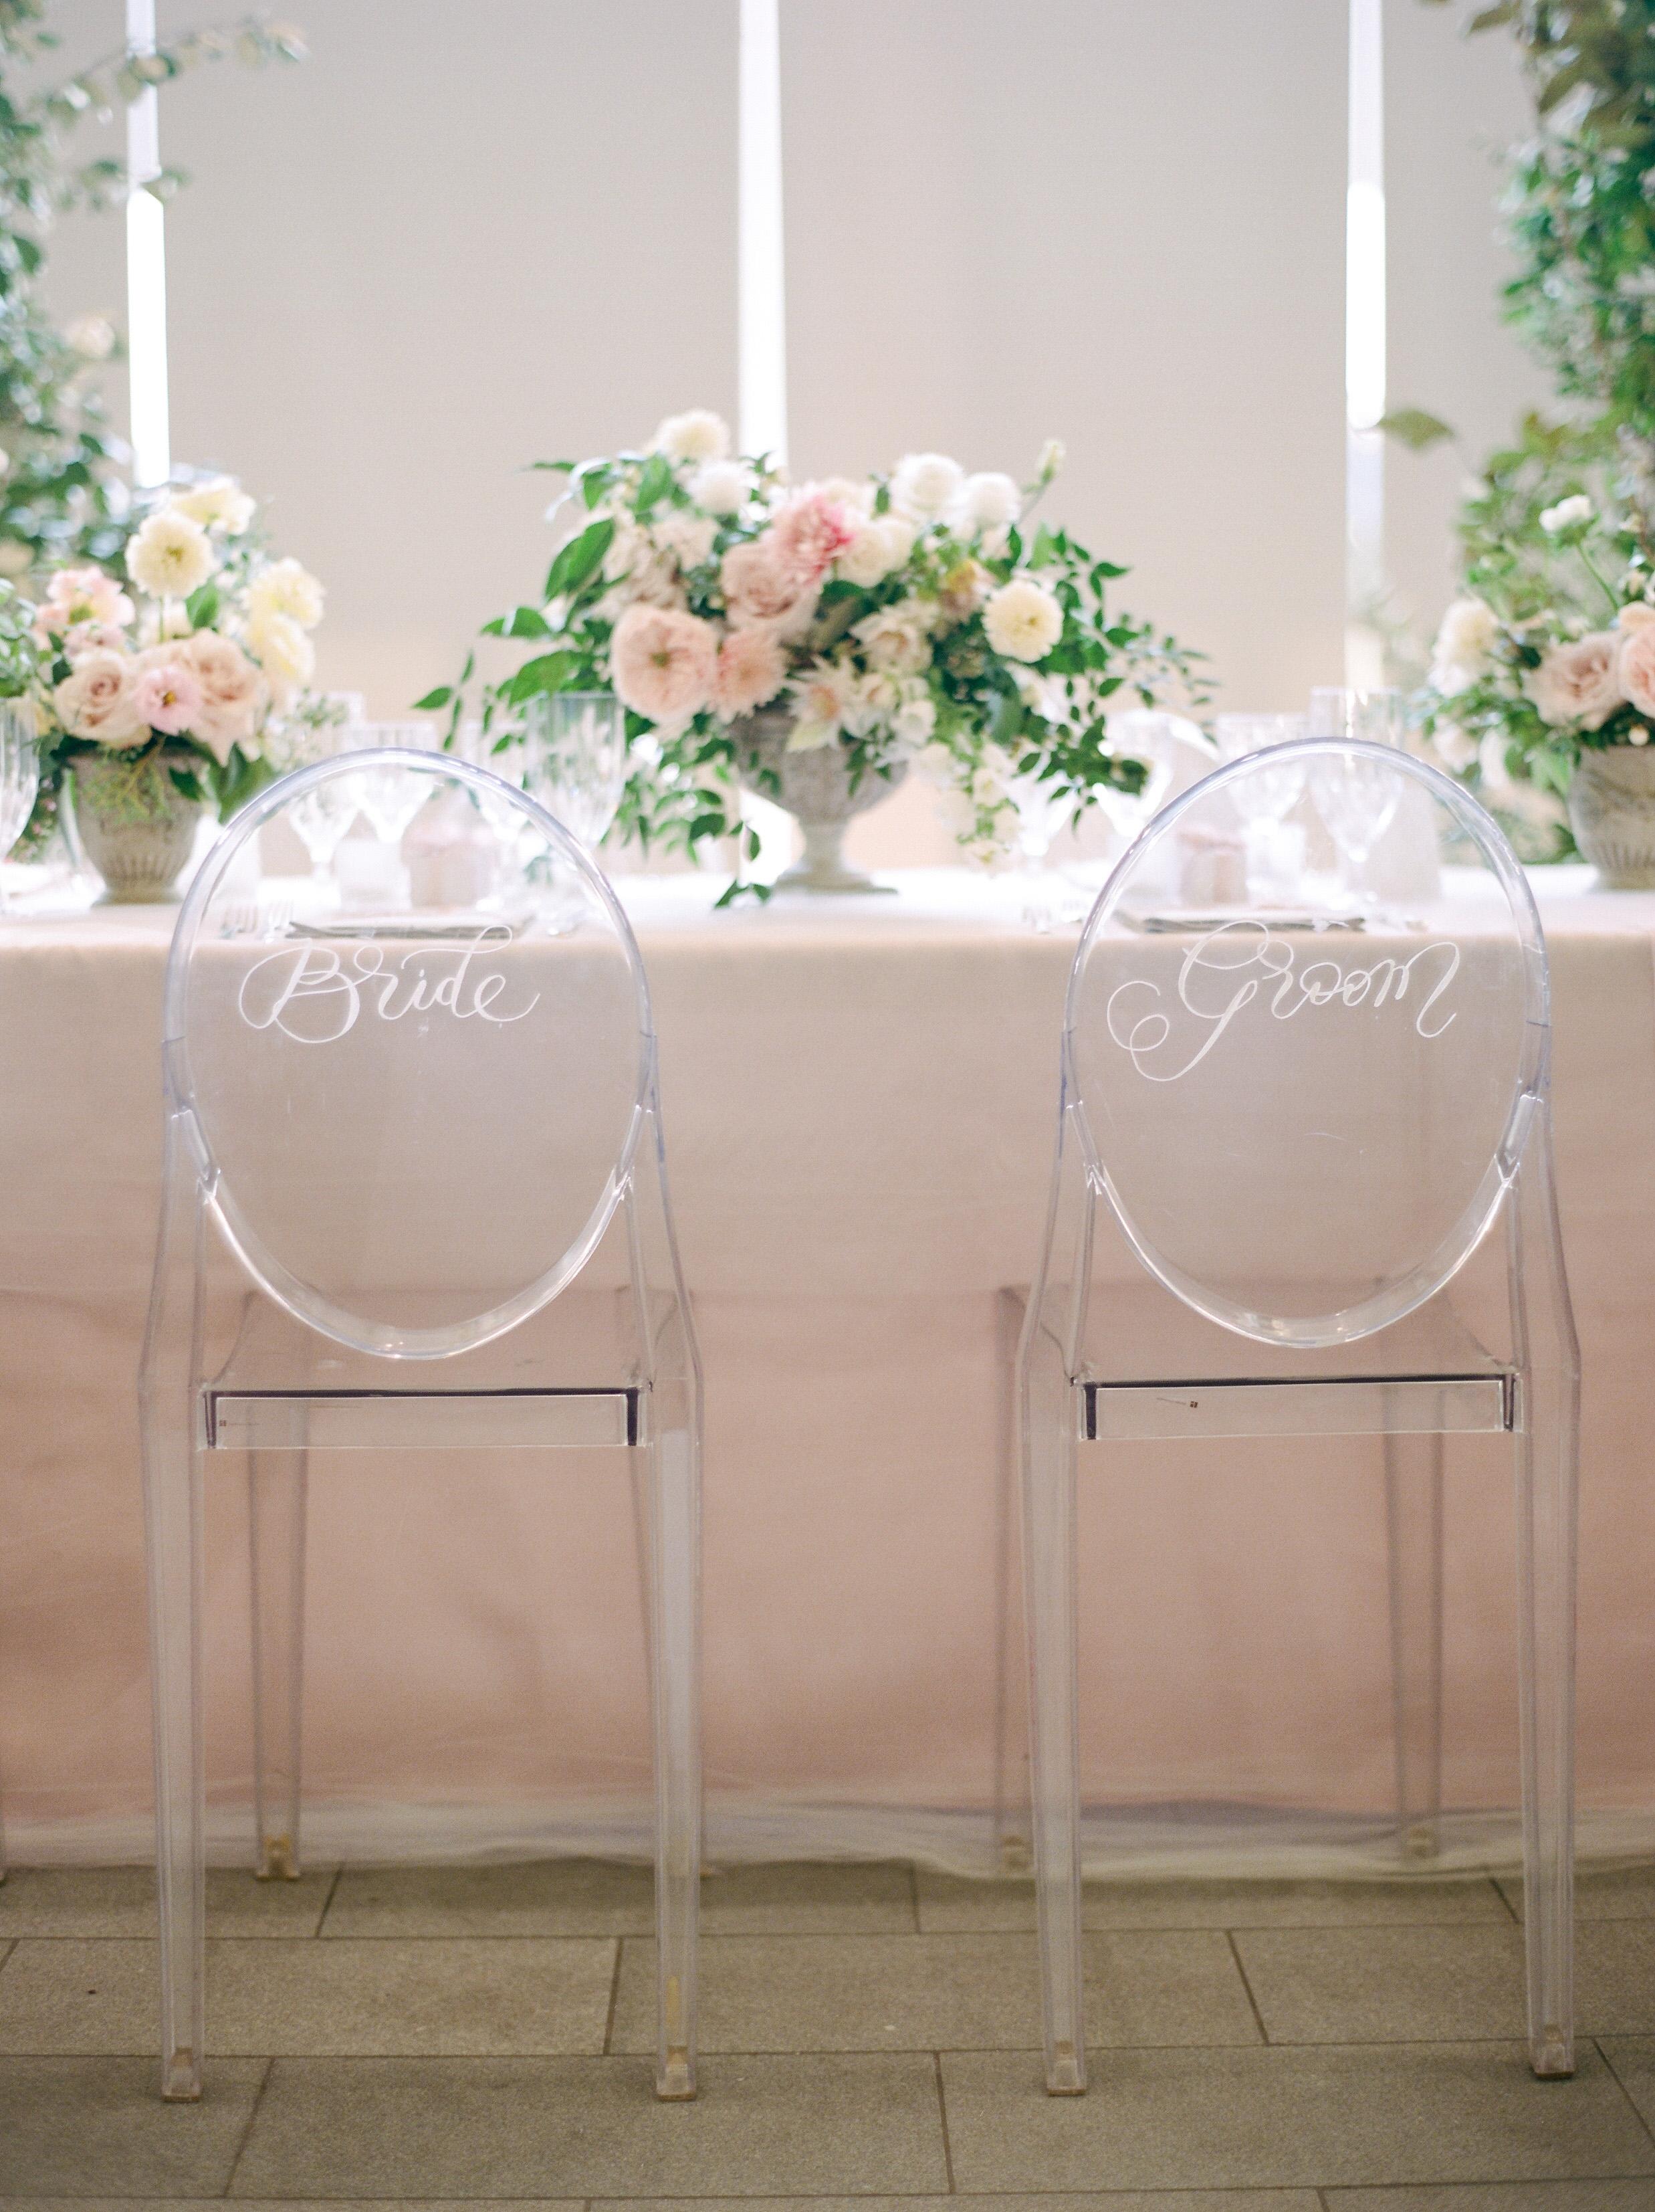 Martha-Stewart-Wedding-Dana-Fernandez-Photography-Josh-Texas-Film-Houston-Wedding-Fine-Art-Photographer-McGovern-Centennial-Gardens-Top-Best-199.jpg